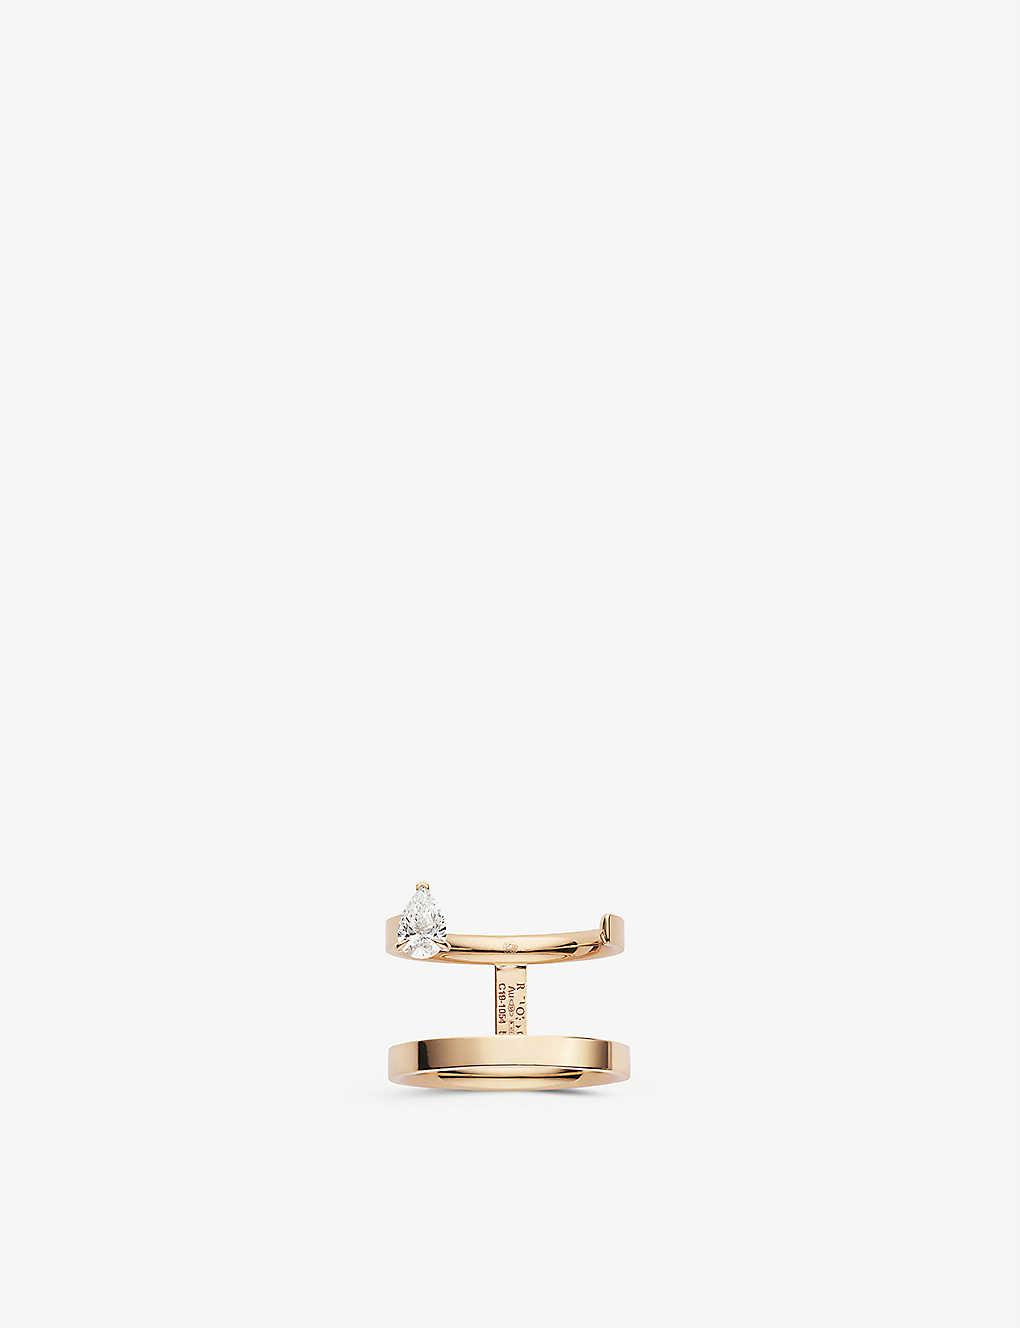 Repossi SERTI SUR VIDE 18CT ROSE-GOLD AND DIAMOND RING